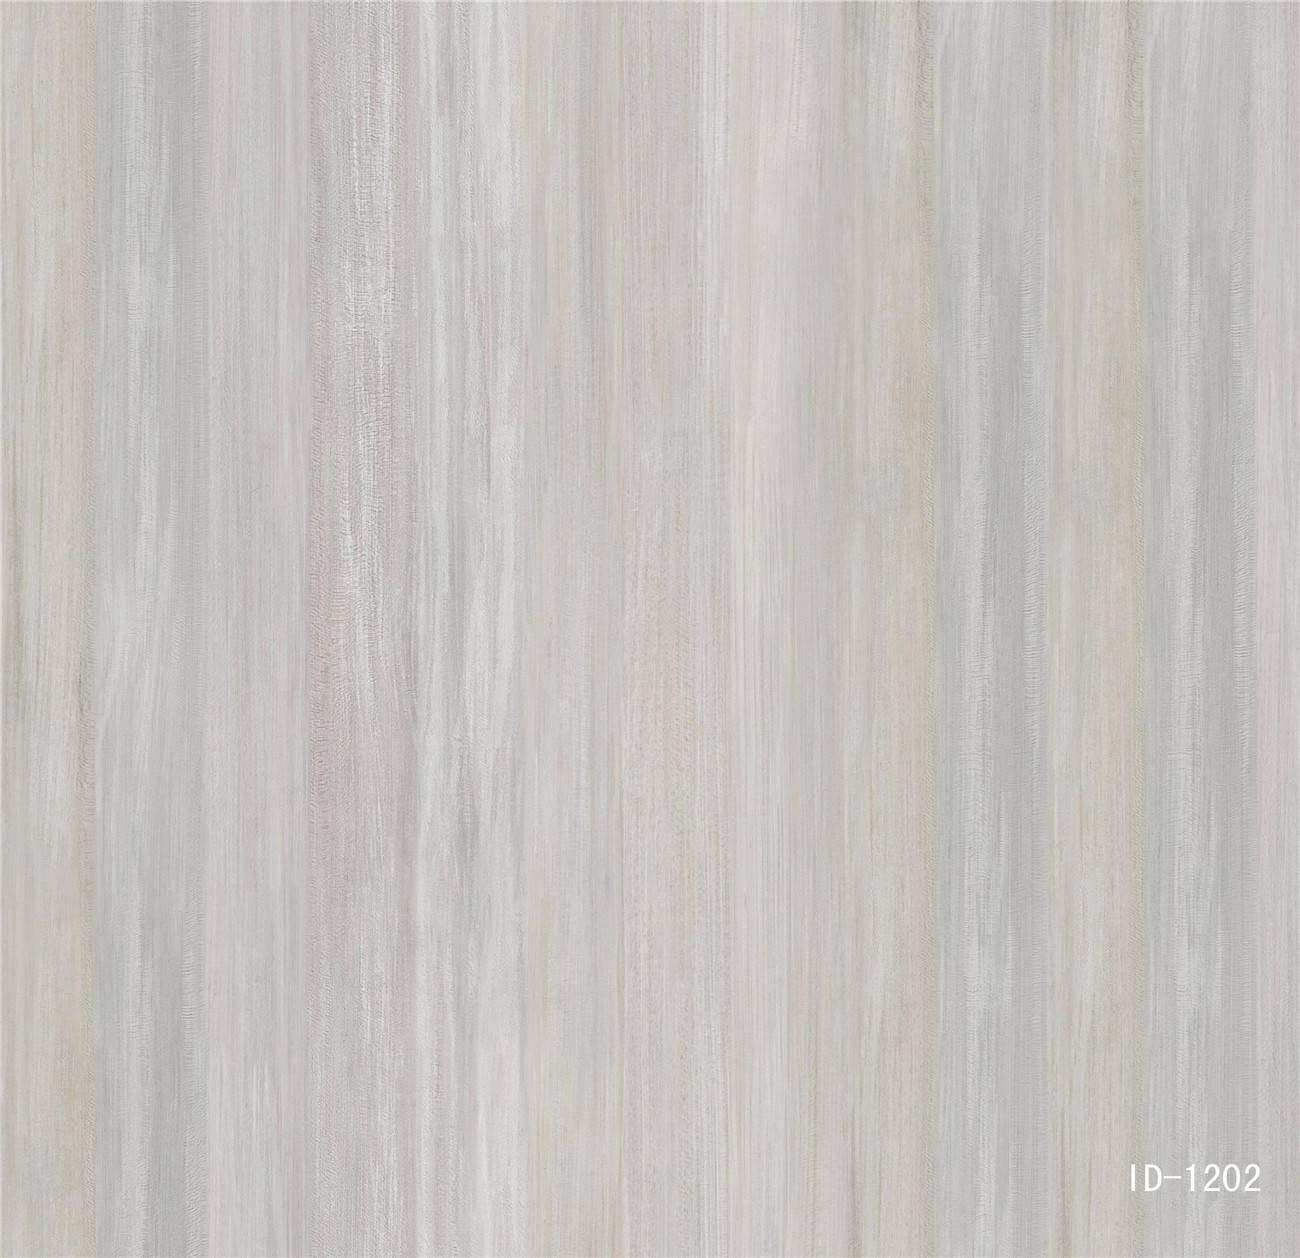 I.DECOR ID-1202 fruit wood decor paper for melamine ID Series 2013 image37